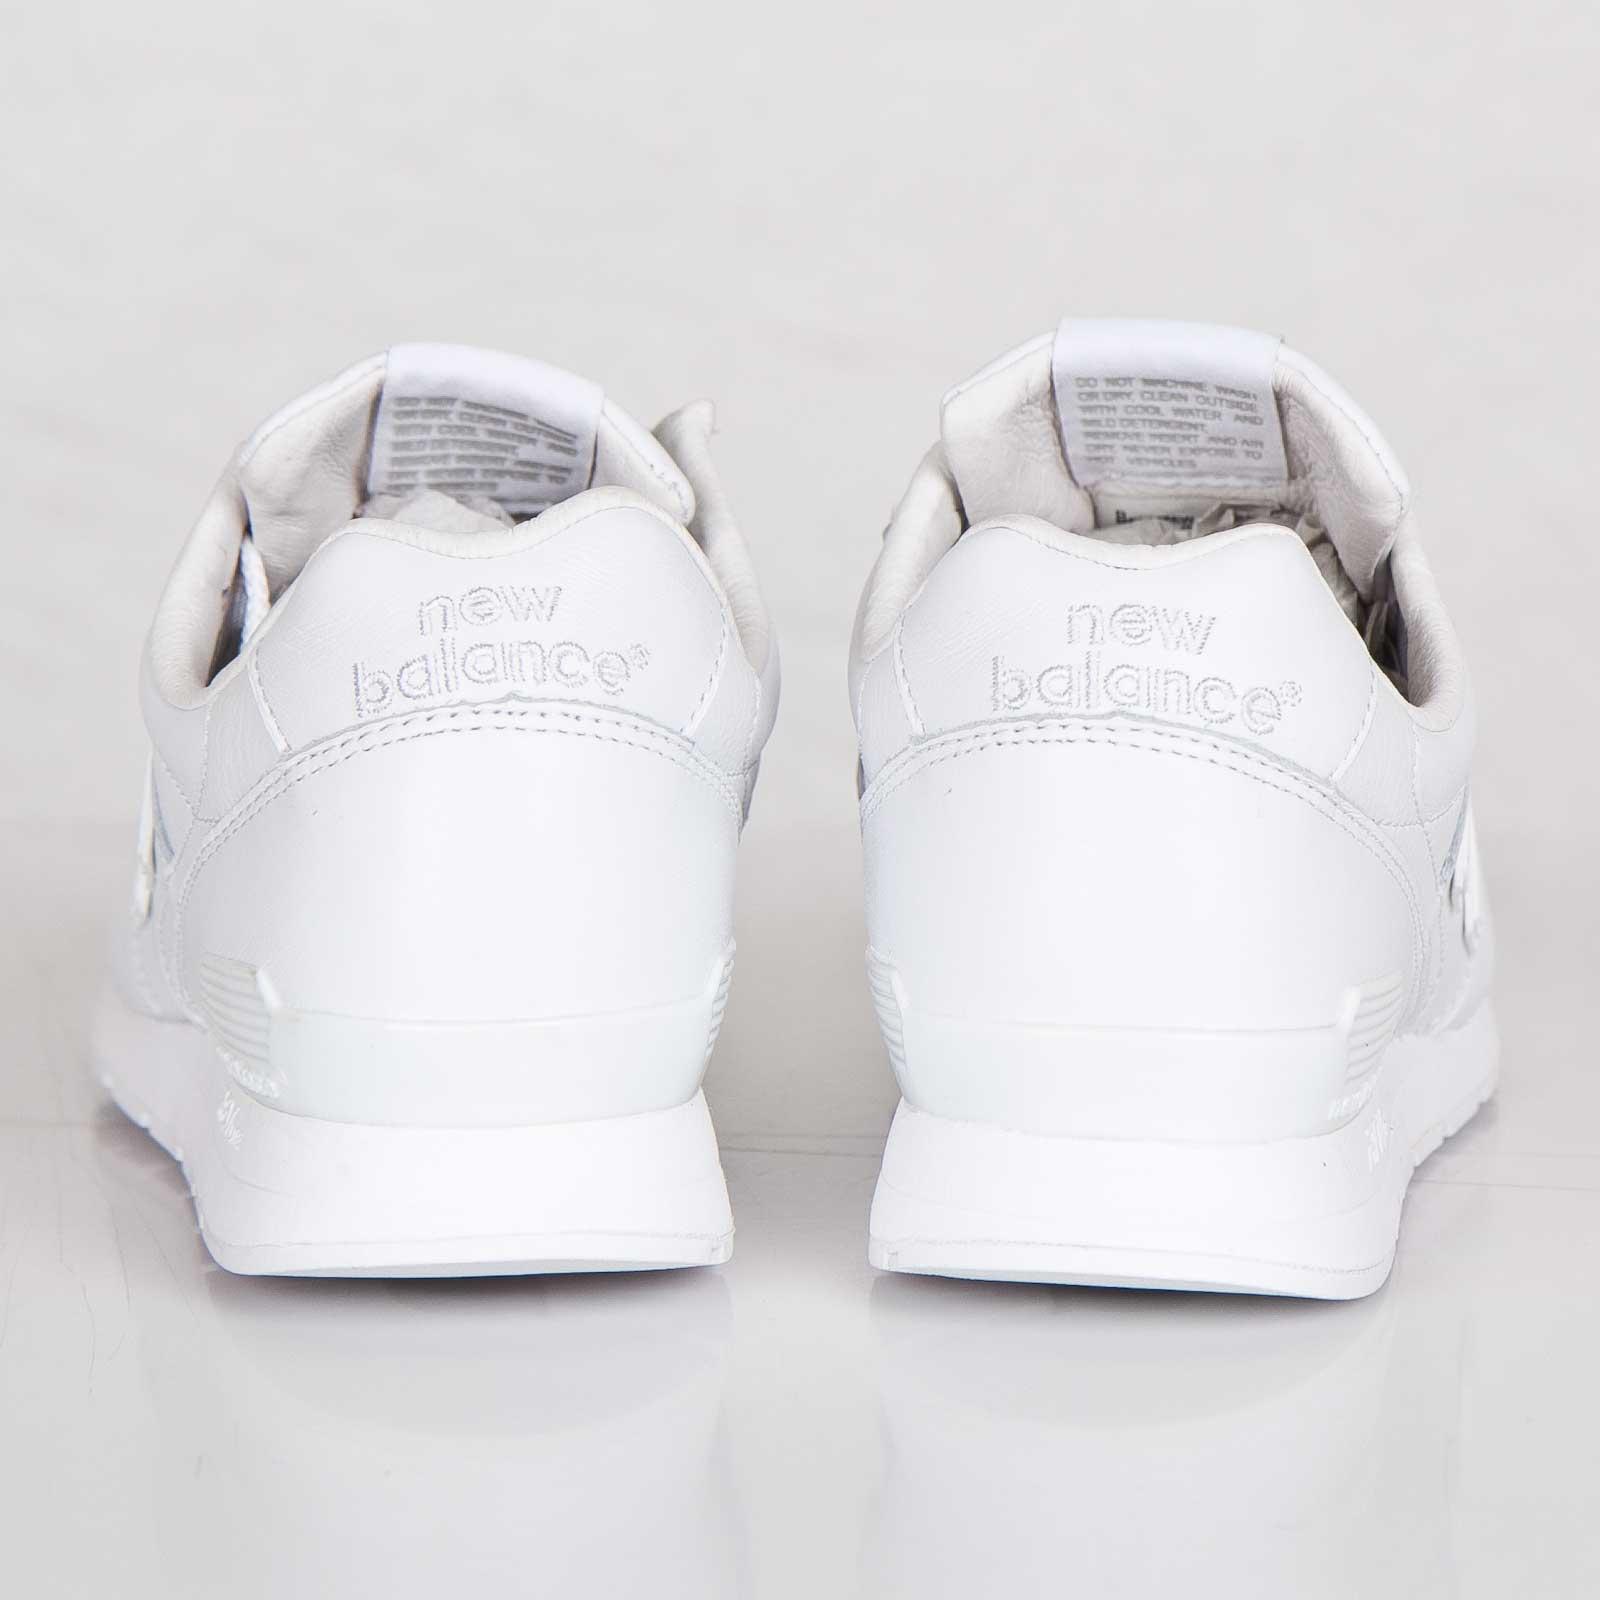 timeless design e9792 db188 New Balance MRL996EW - Mrl996ew - Sneakersnstuff | sneakers ...